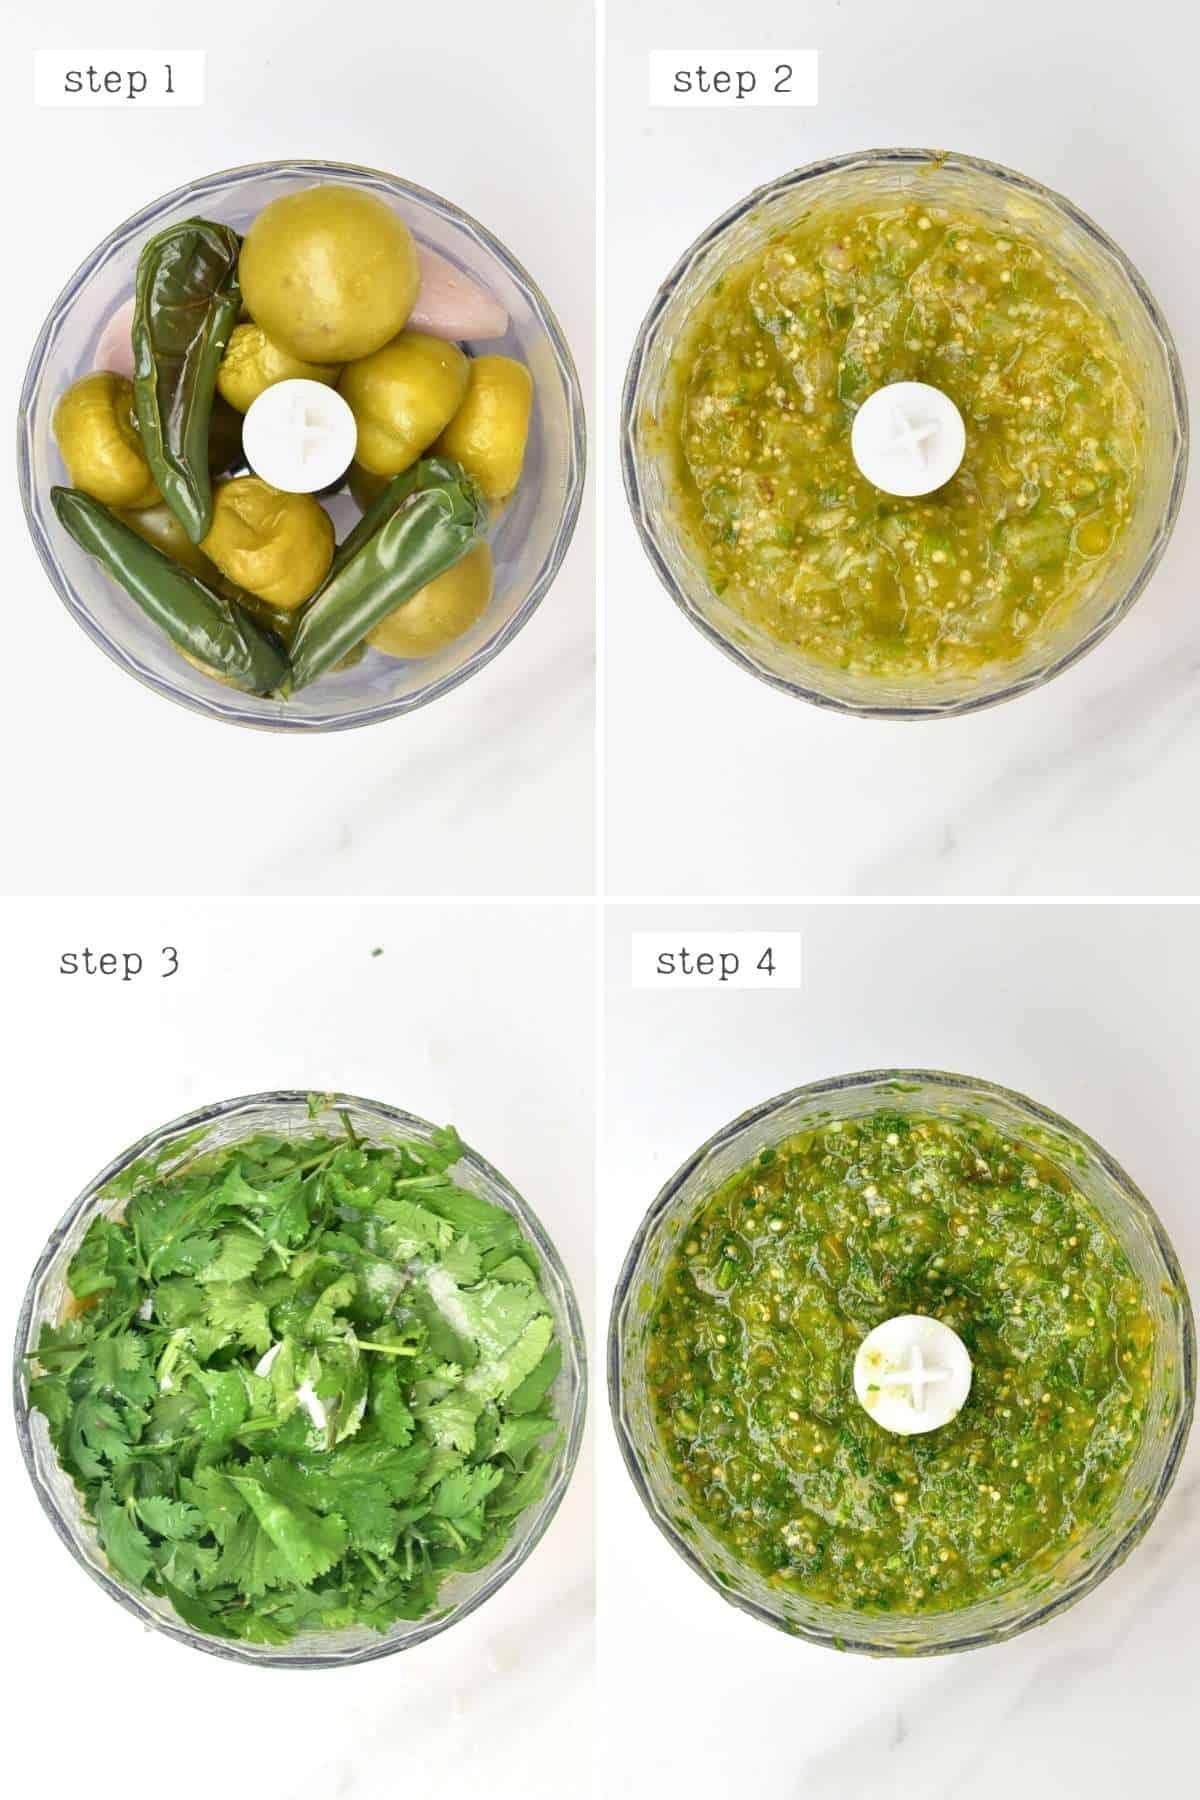 Steps for making salsa verde